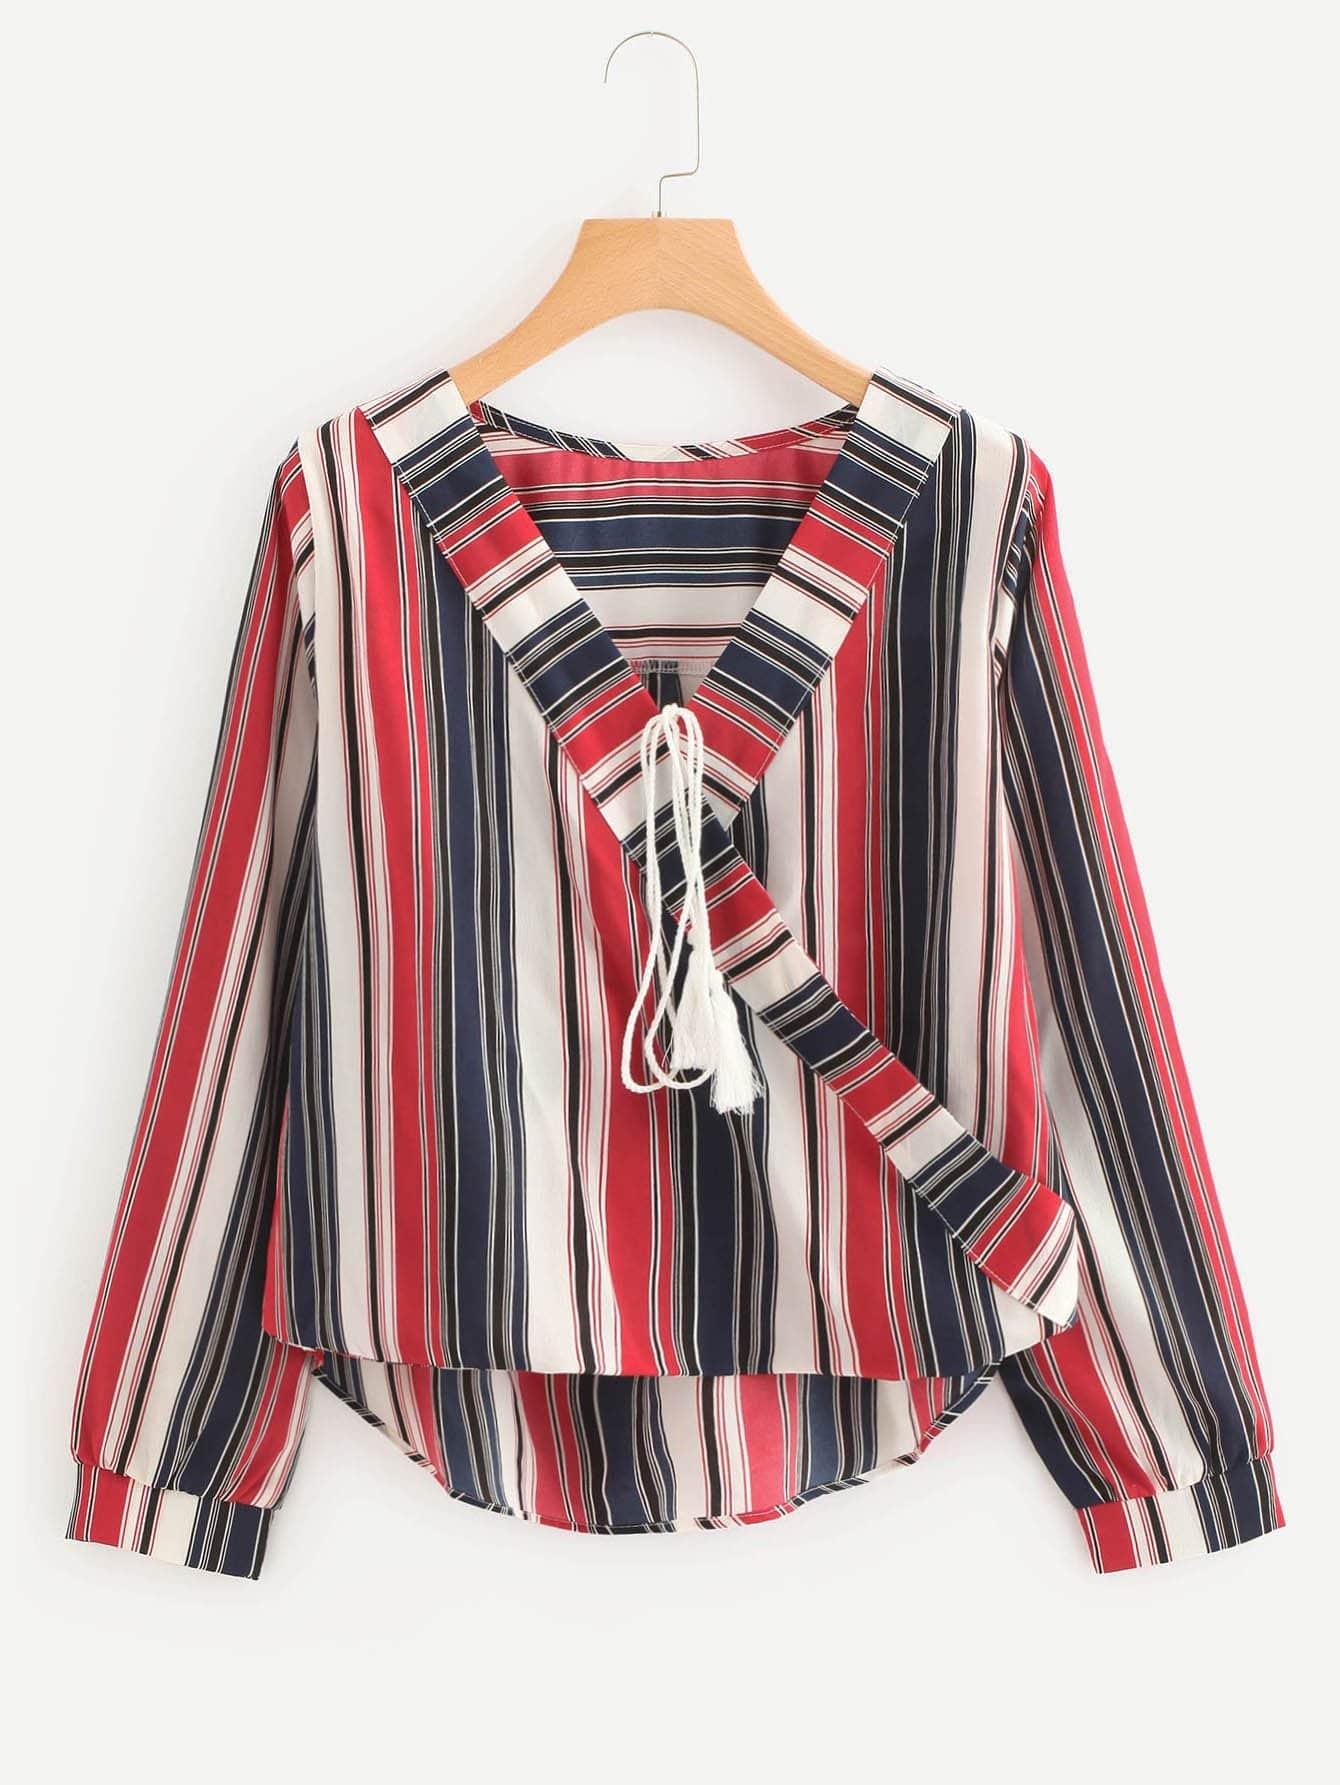 Contrast Striped Surplice Neckline Tassel Tie Blouse contrast striped v neckline flute sleeve blouse